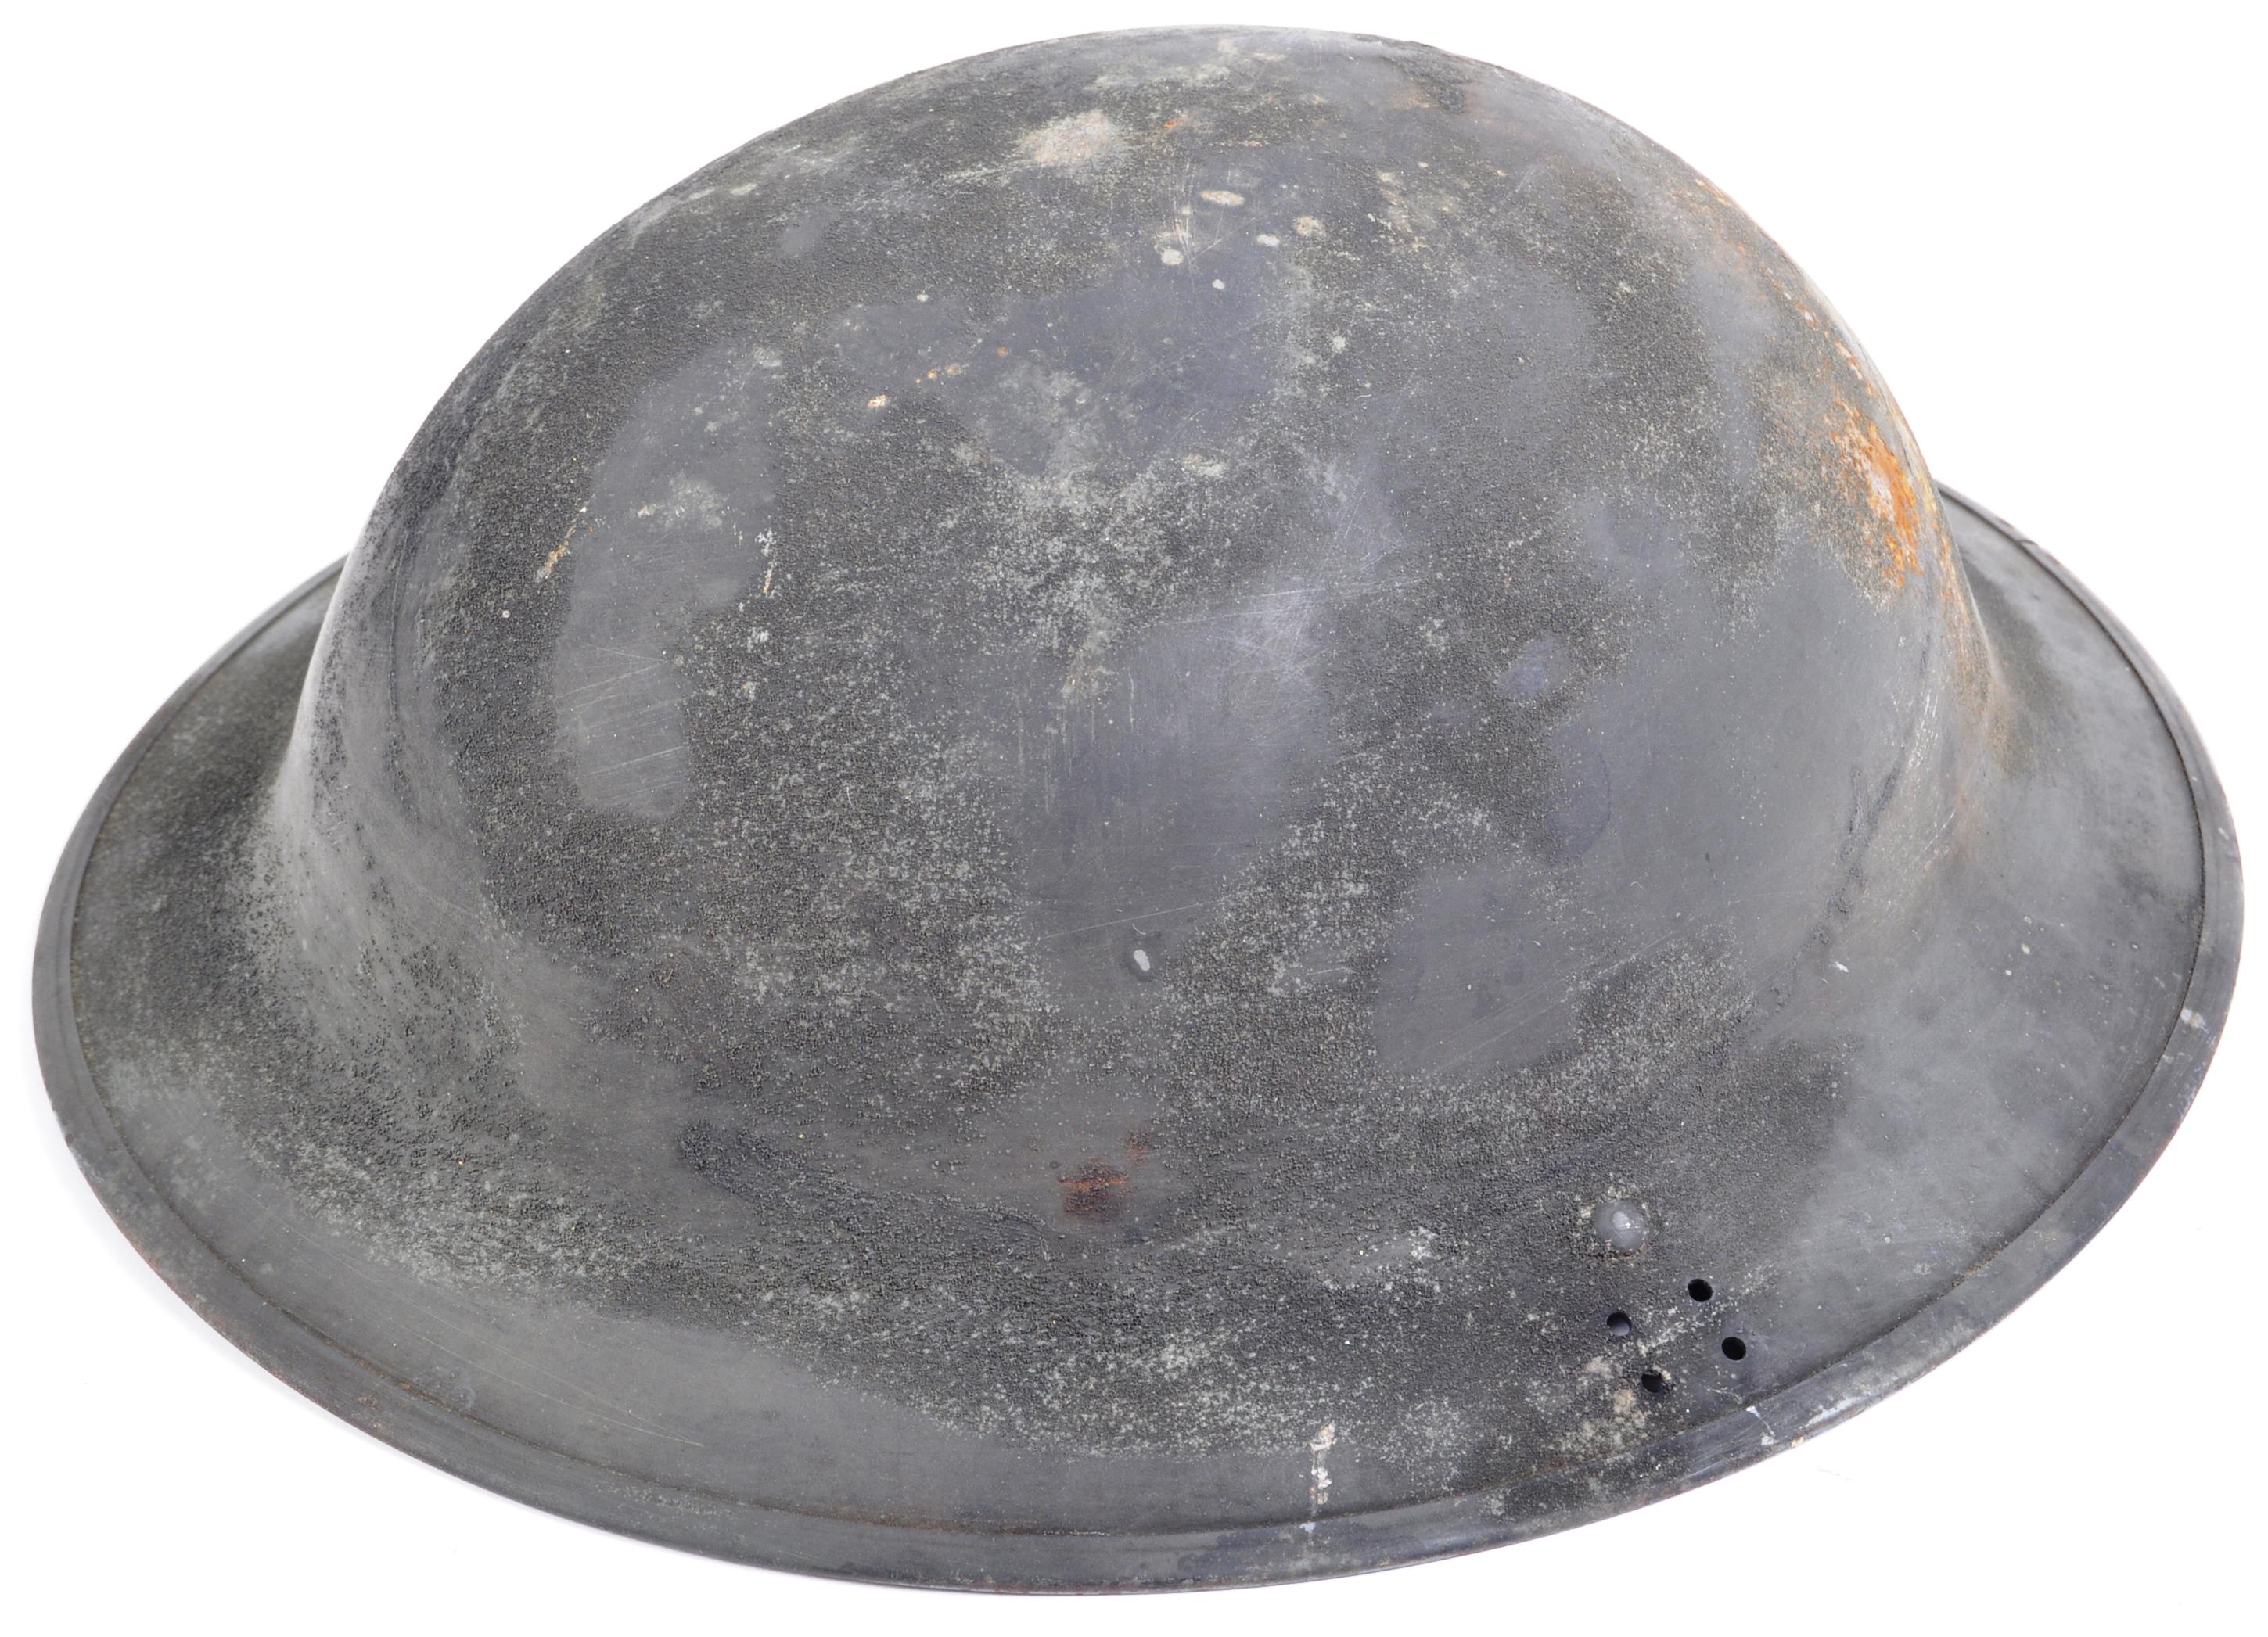 WWII SECOND WORLD WAR ROYAL NAVY BRODIE HELMET & SHIRT - Image 4 of 11